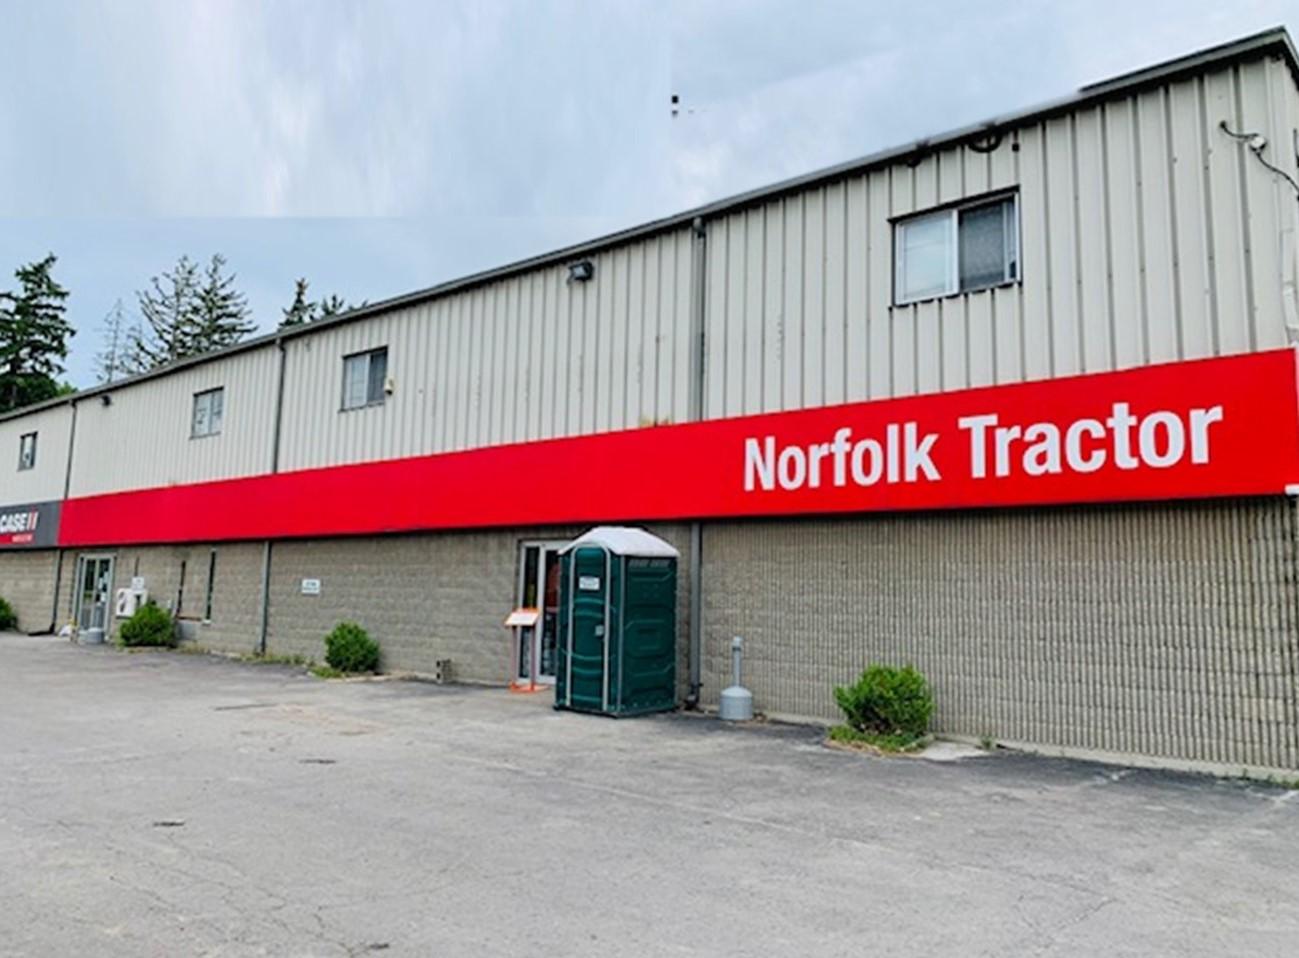 Norfolk Tractor Now.jpg